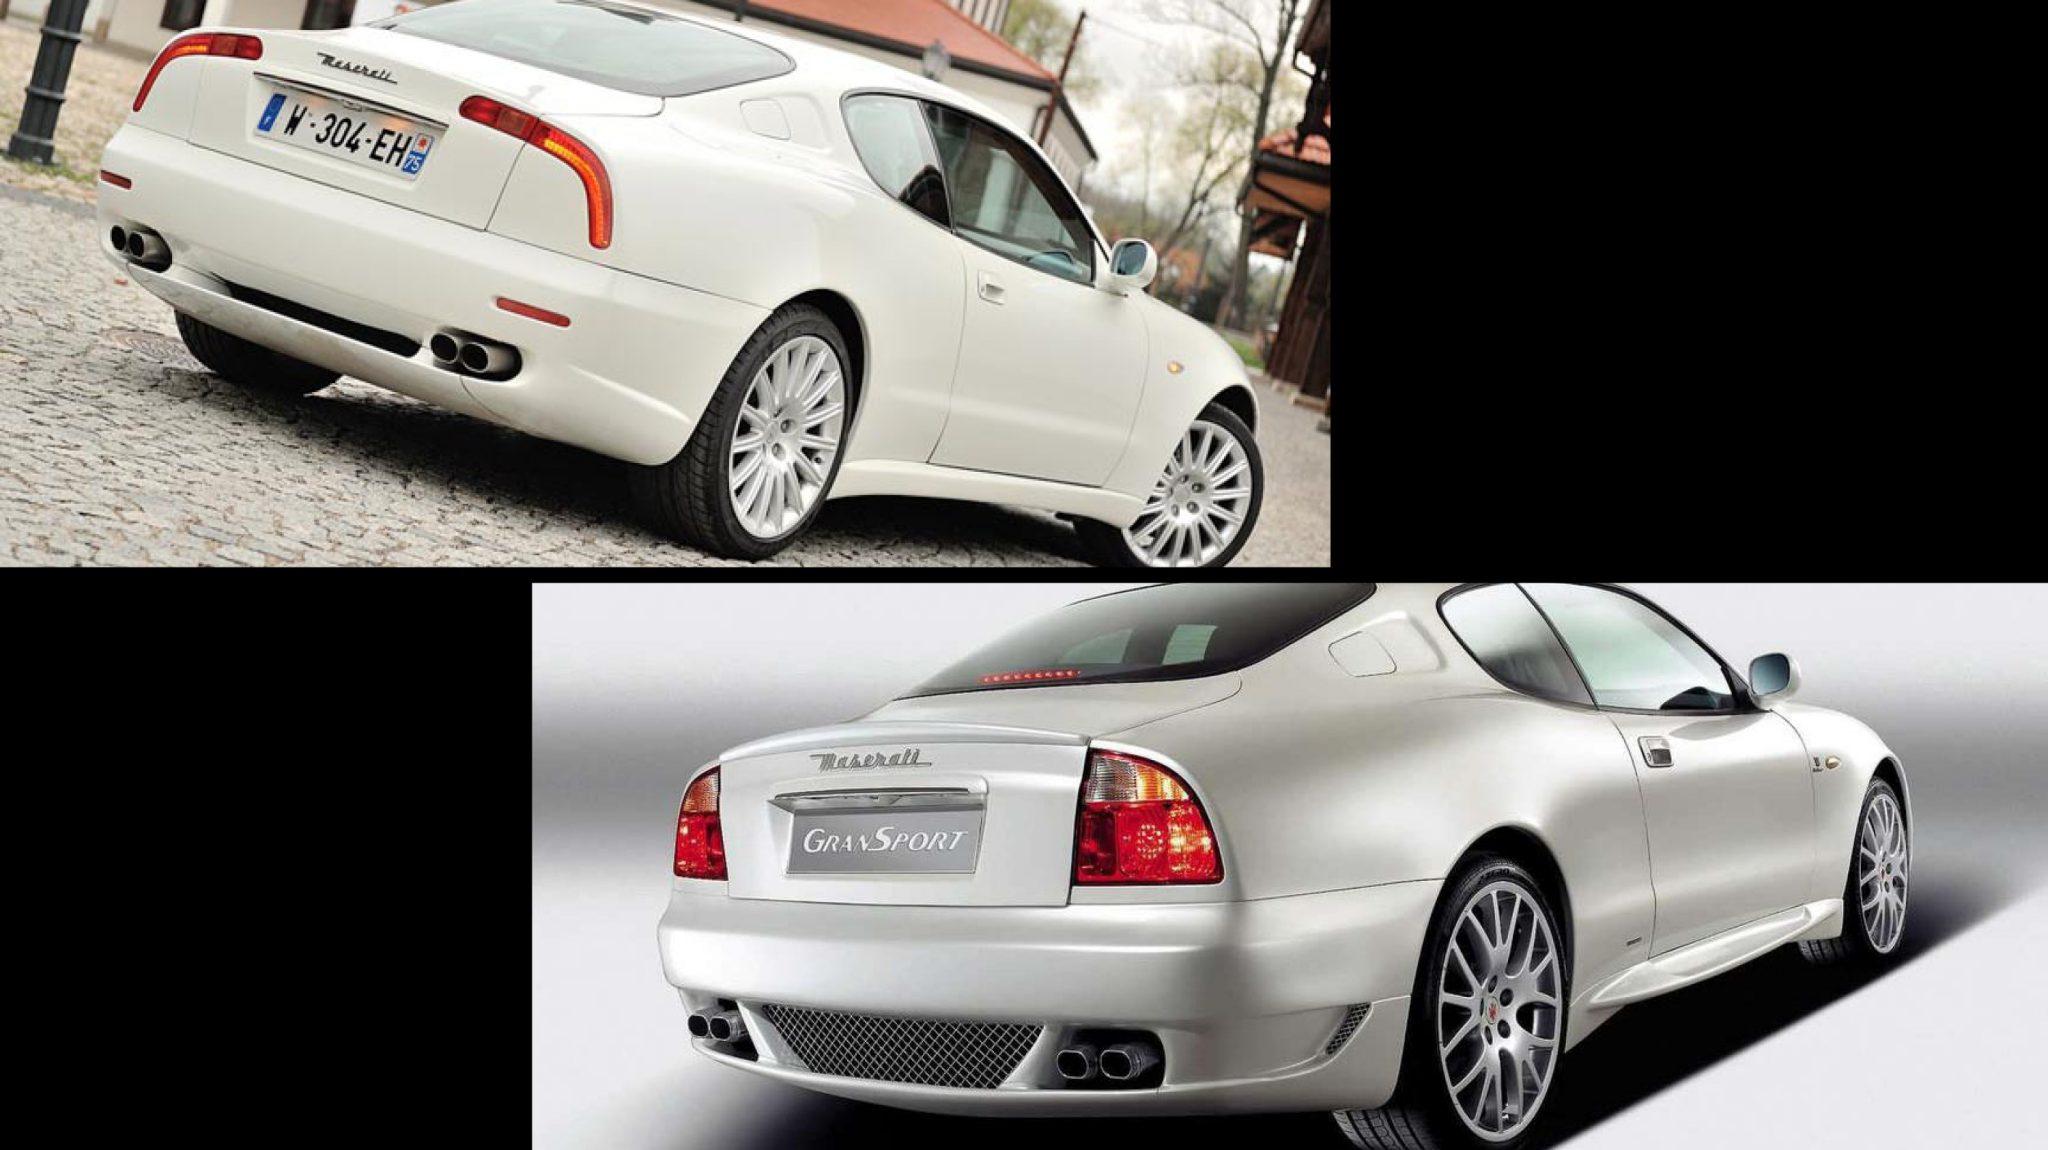 Maserati 3200 GT Boomerang Facelift vs Pre-facelift